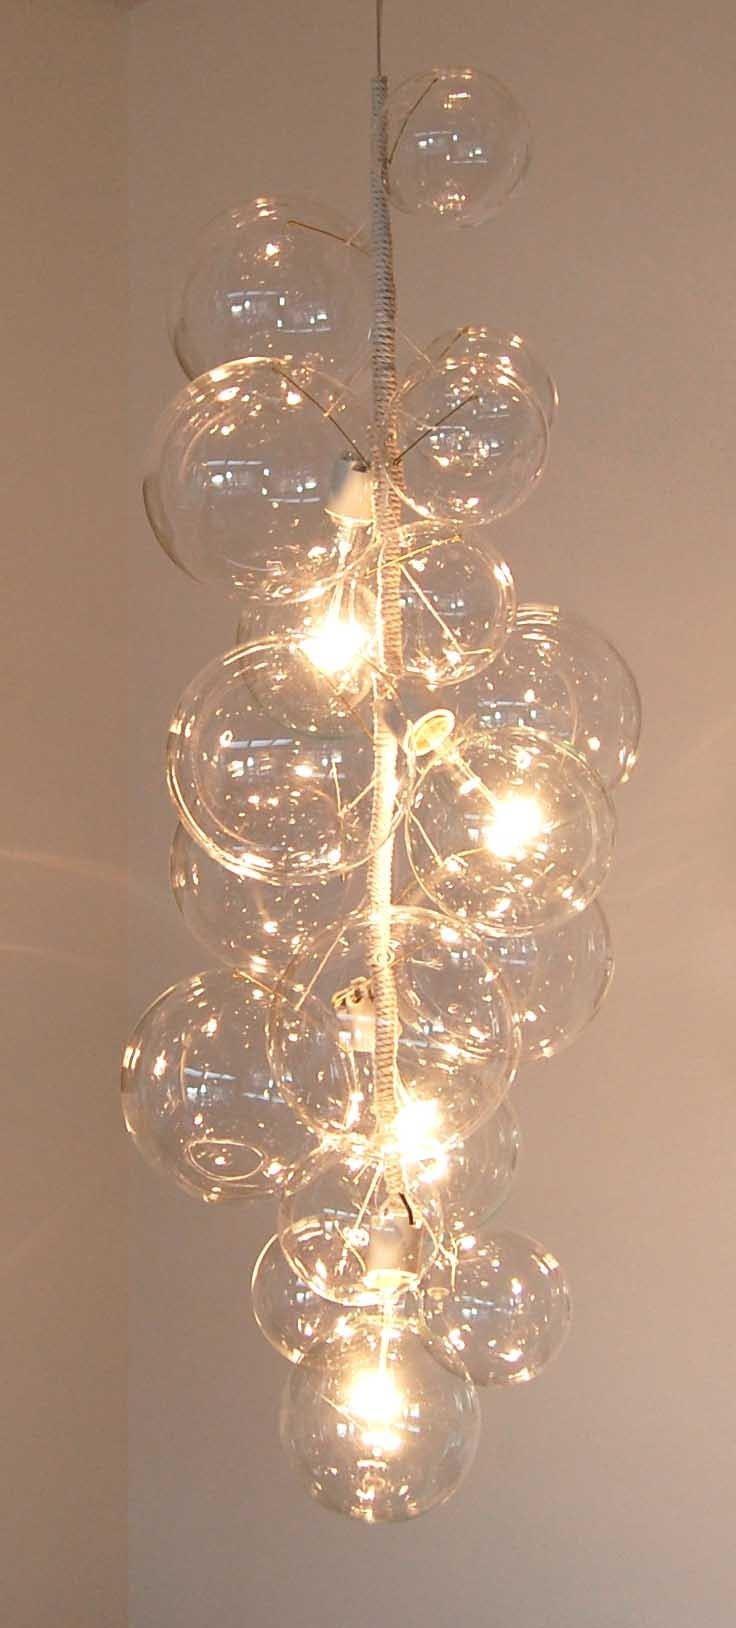 Bubble Glass Chandelier By Solaria Light Fixtures Design